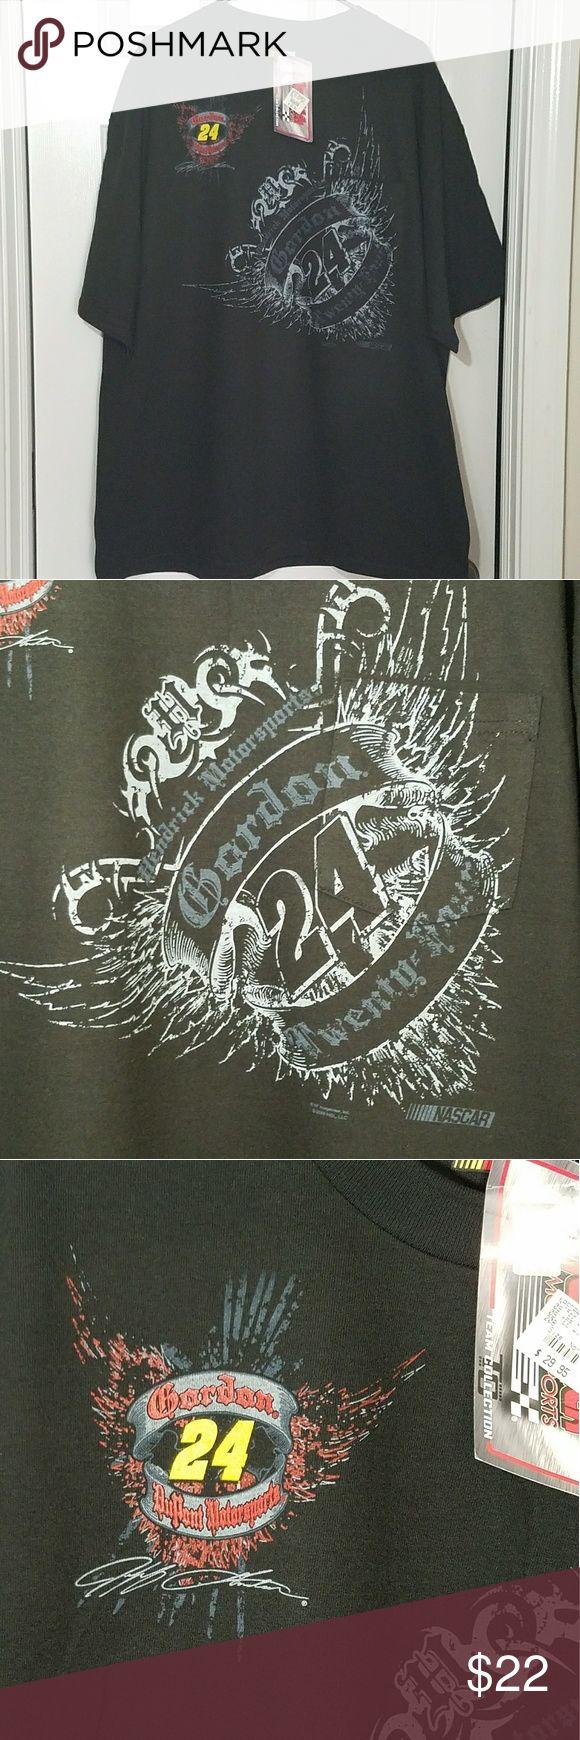 Racewear Nascar Jeff Gordon DuPont Motorsports NWT Nascar fan black tee shirt driver #24 Jeff Gordon Hendrick Motorsports Nascar Shirts Tees - Short Sleeve